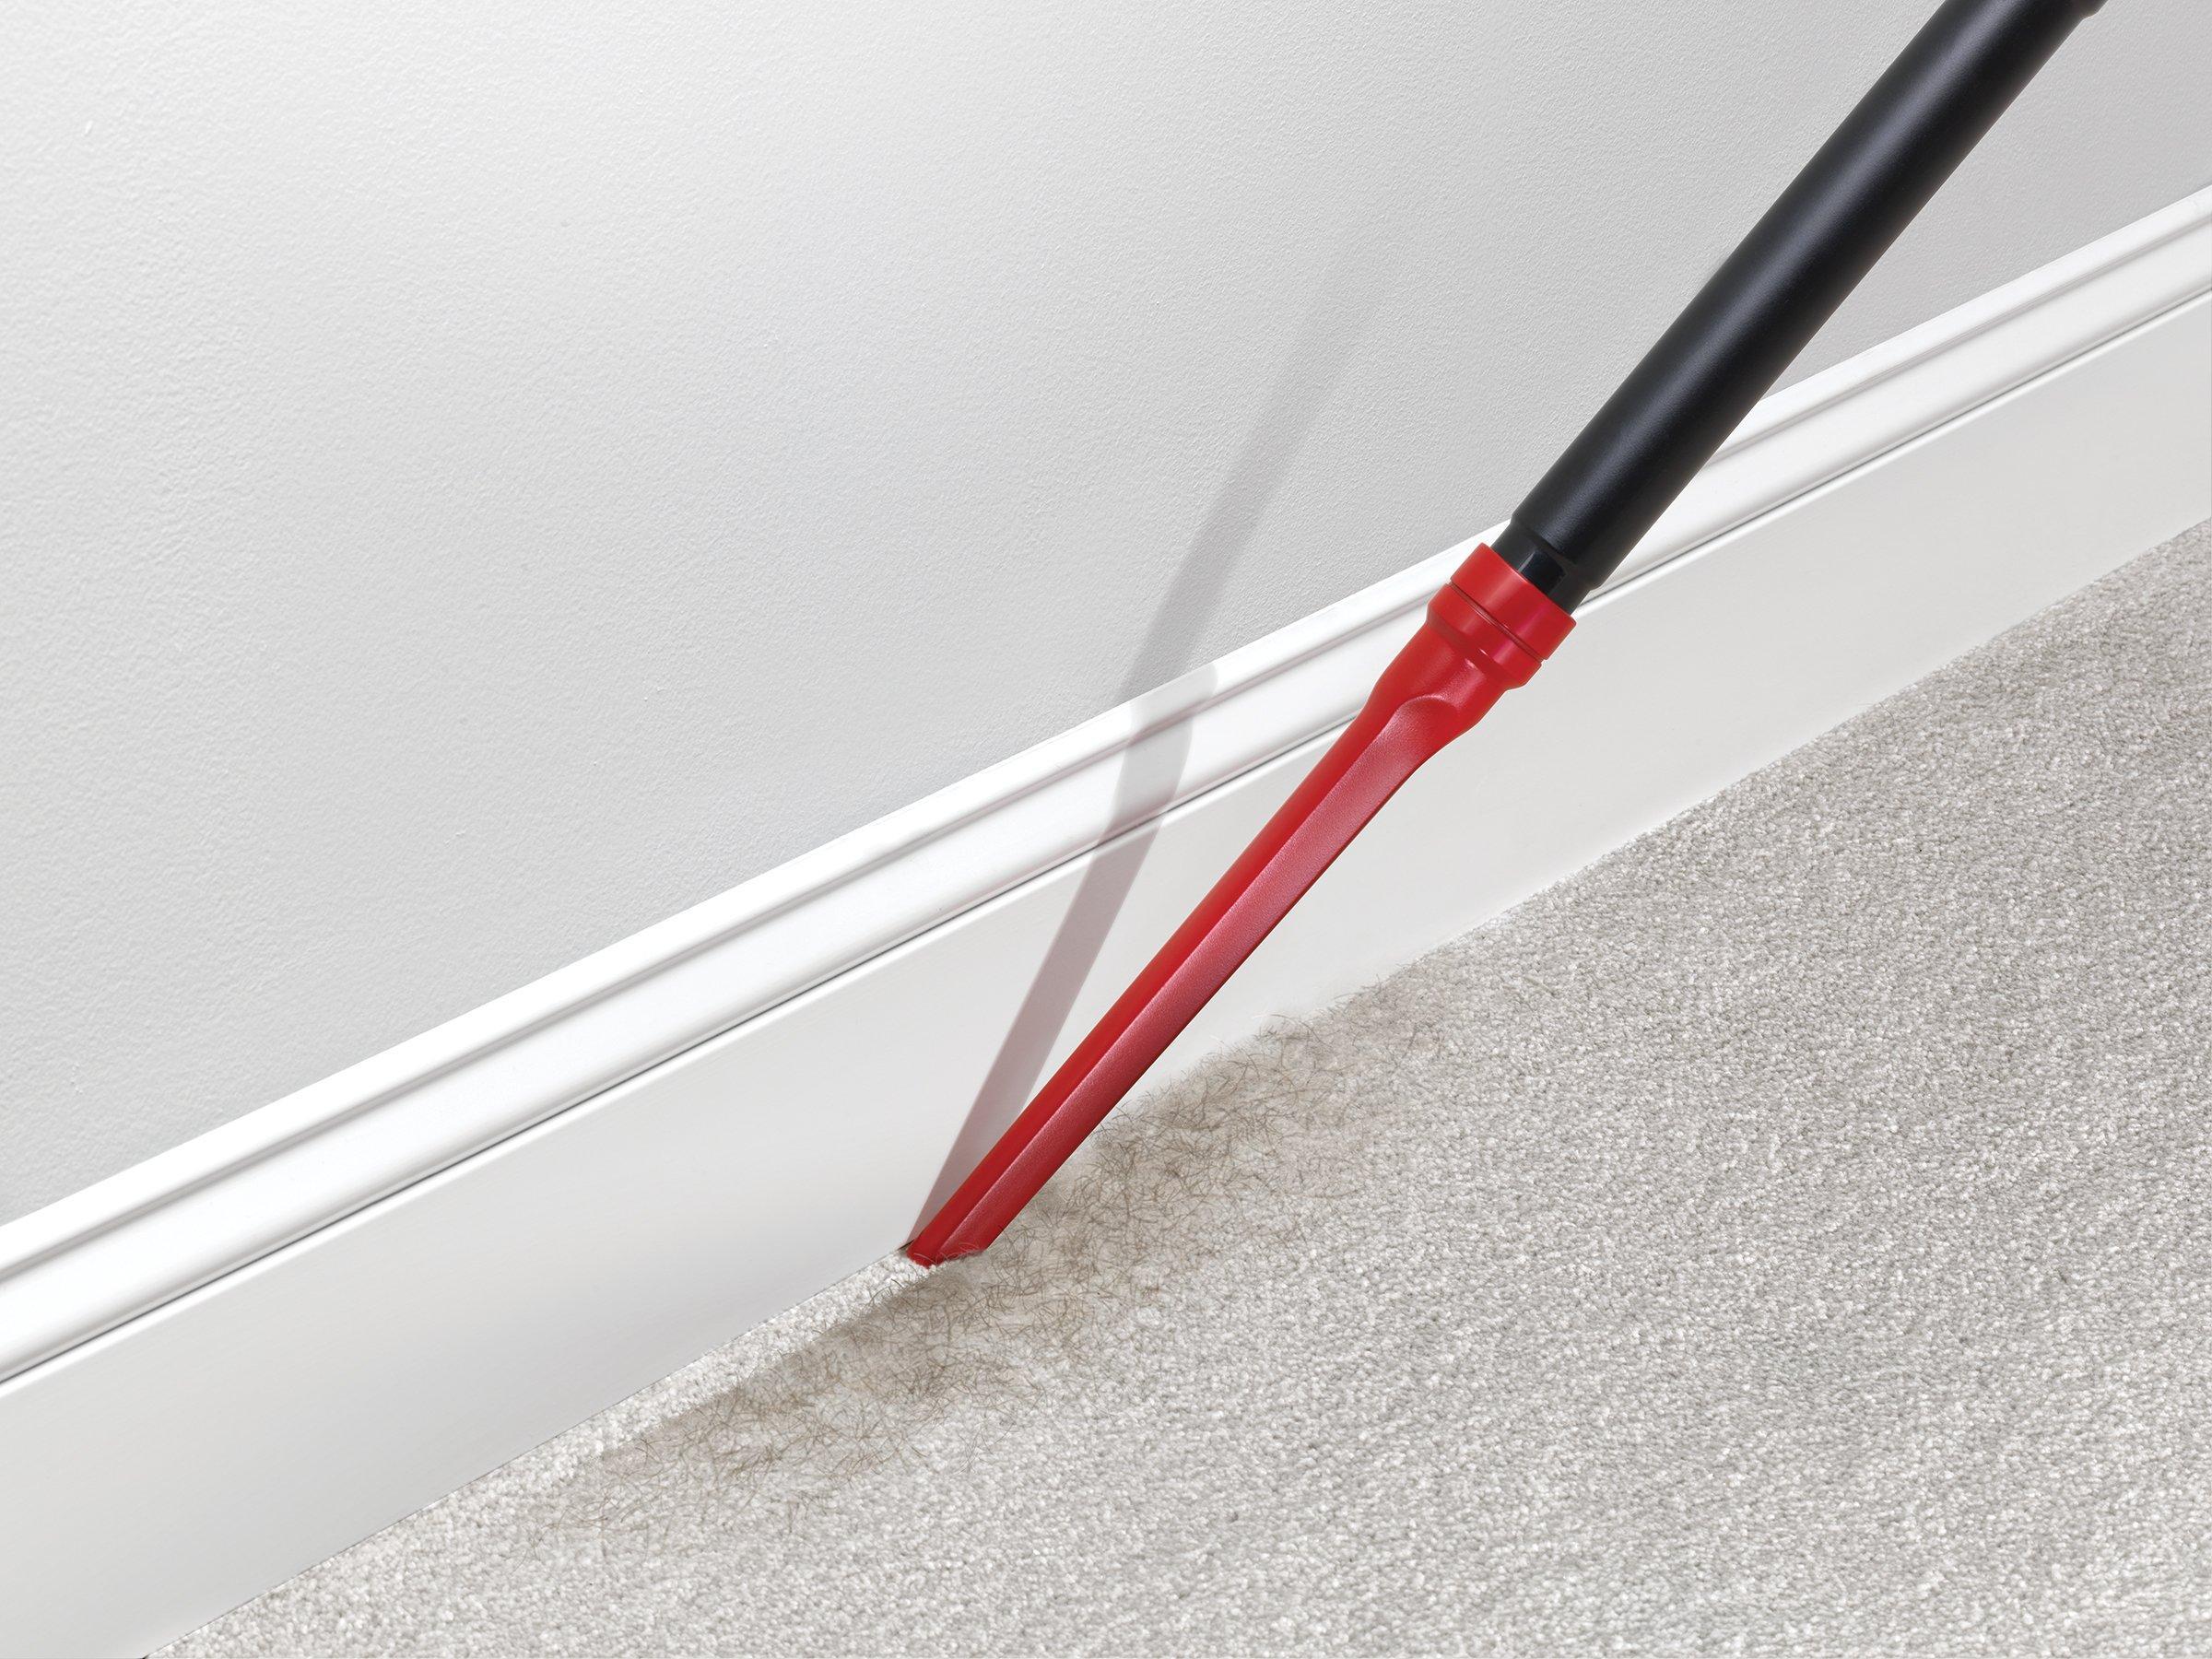 WindTunnel 3 High Performance Plus Upright Vacuum4